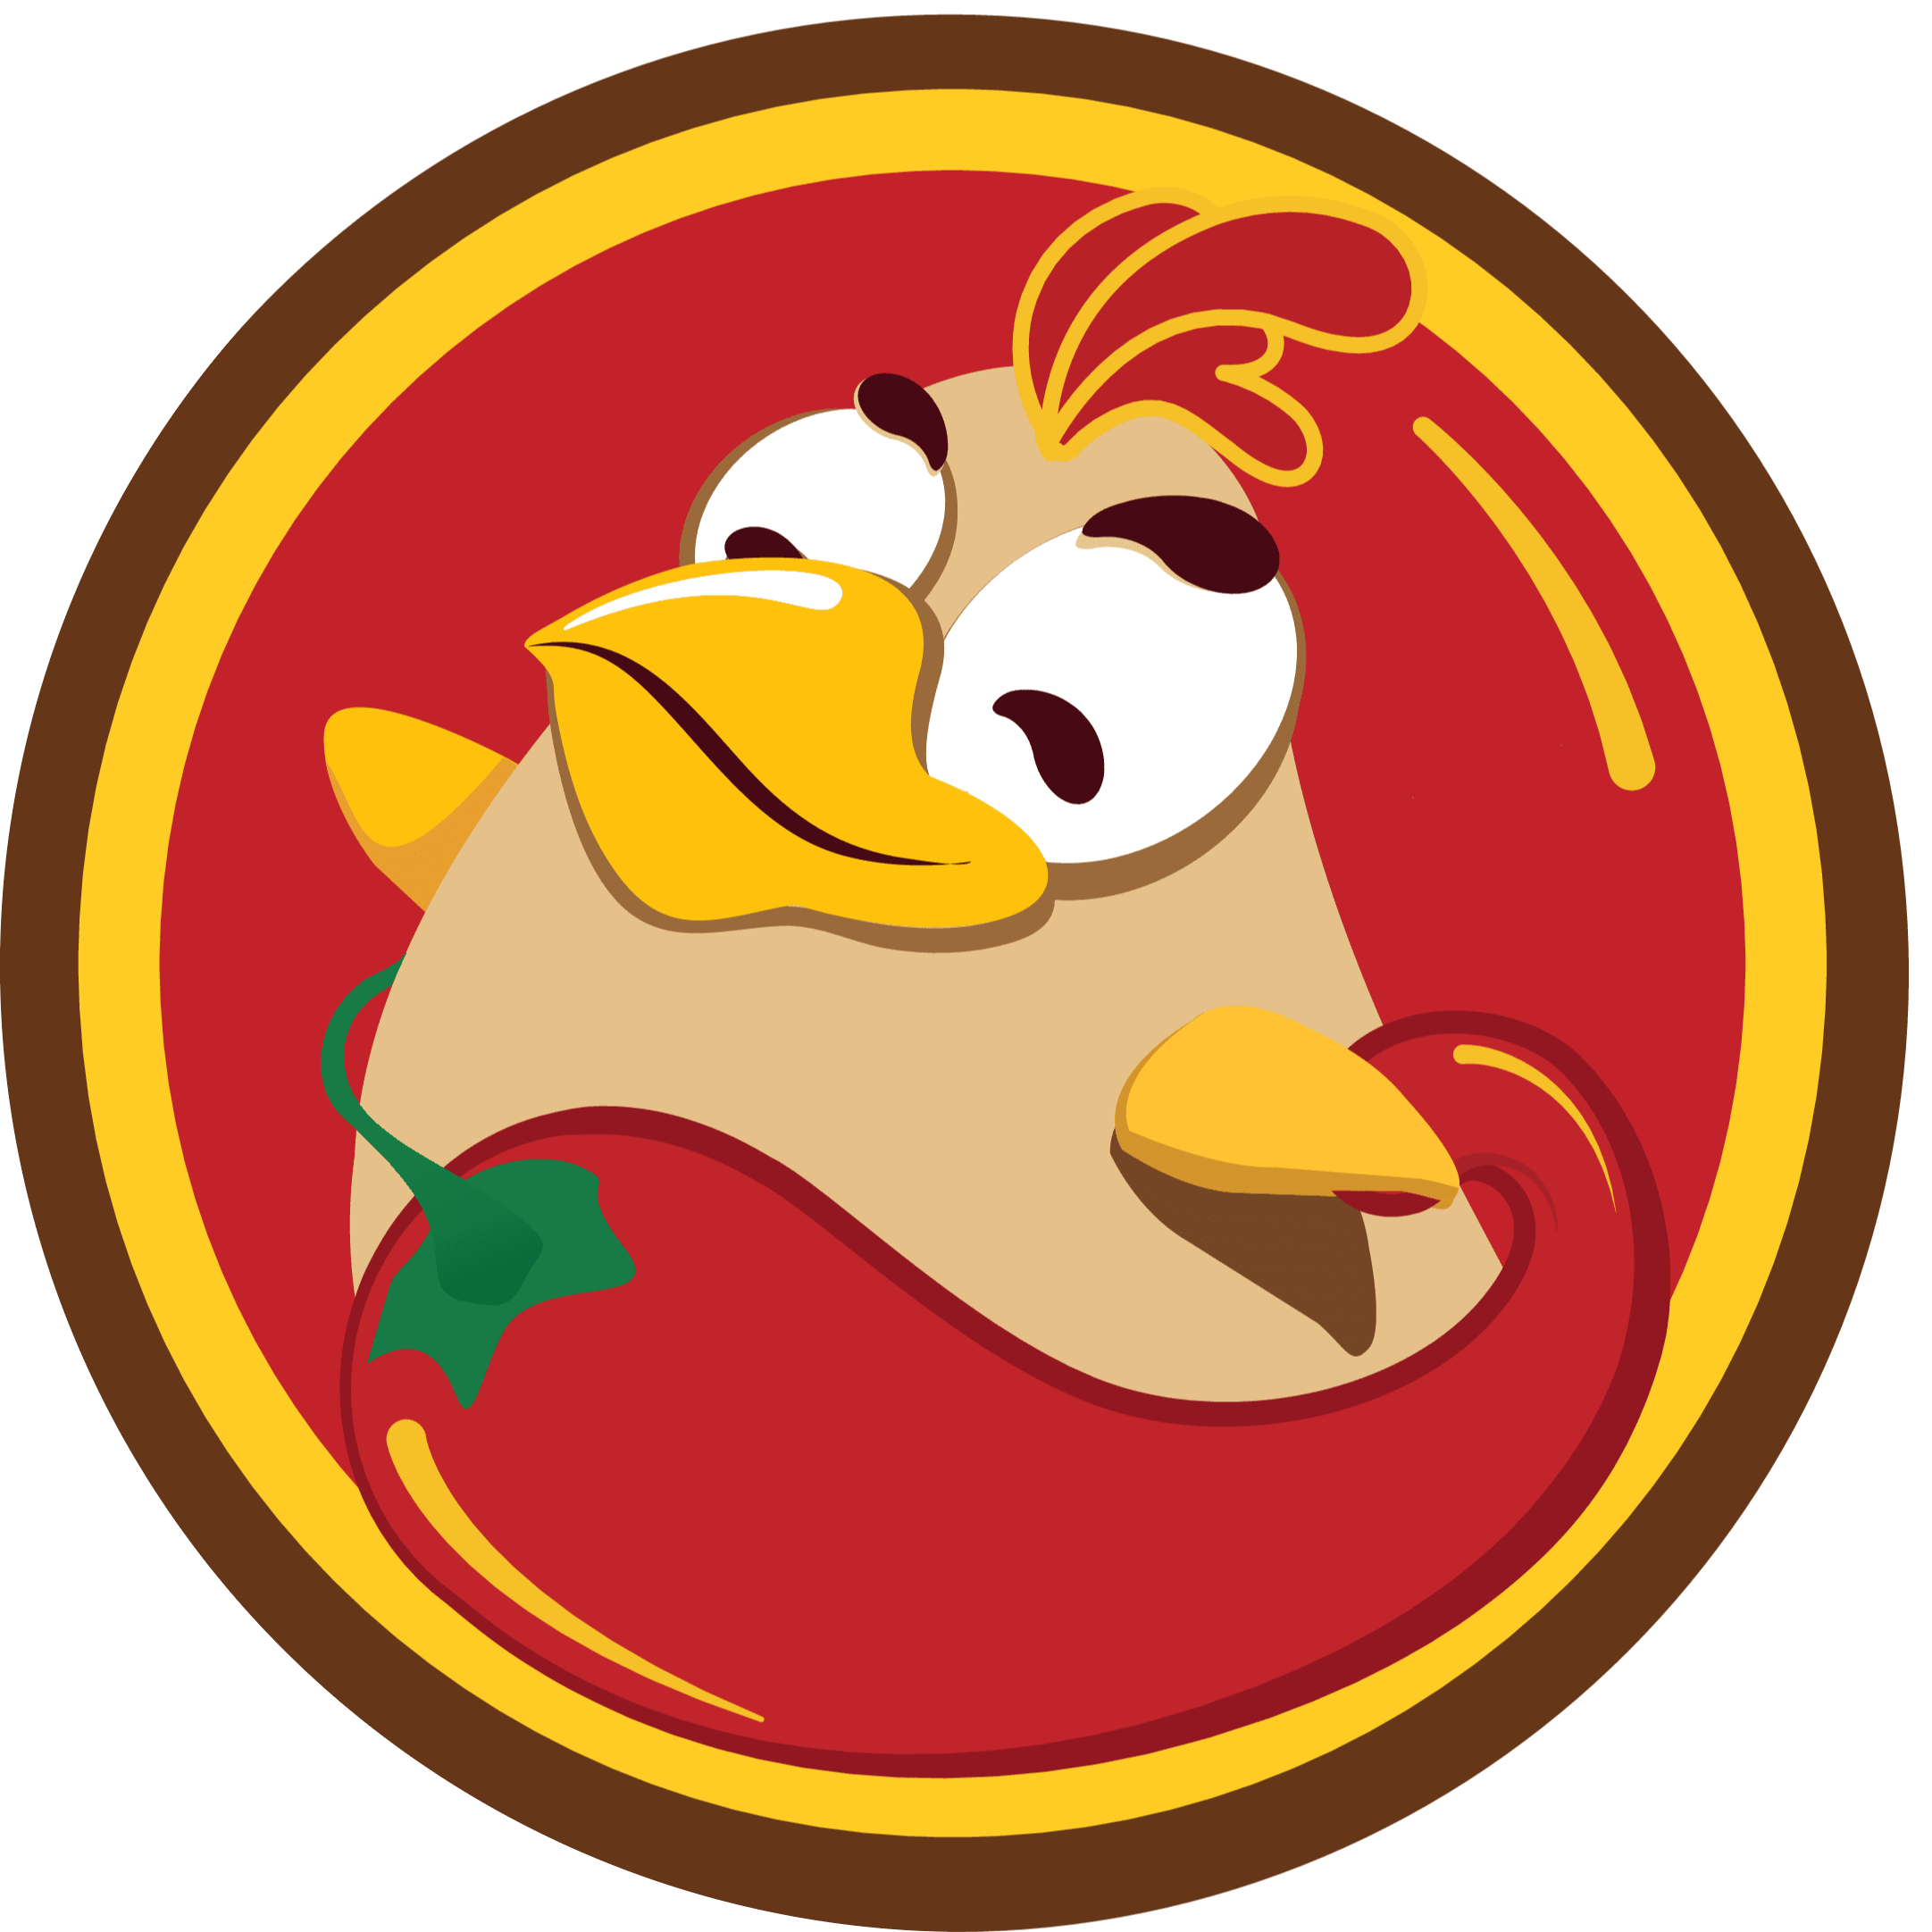 @grabfooddelivery Profile Image | Linktree